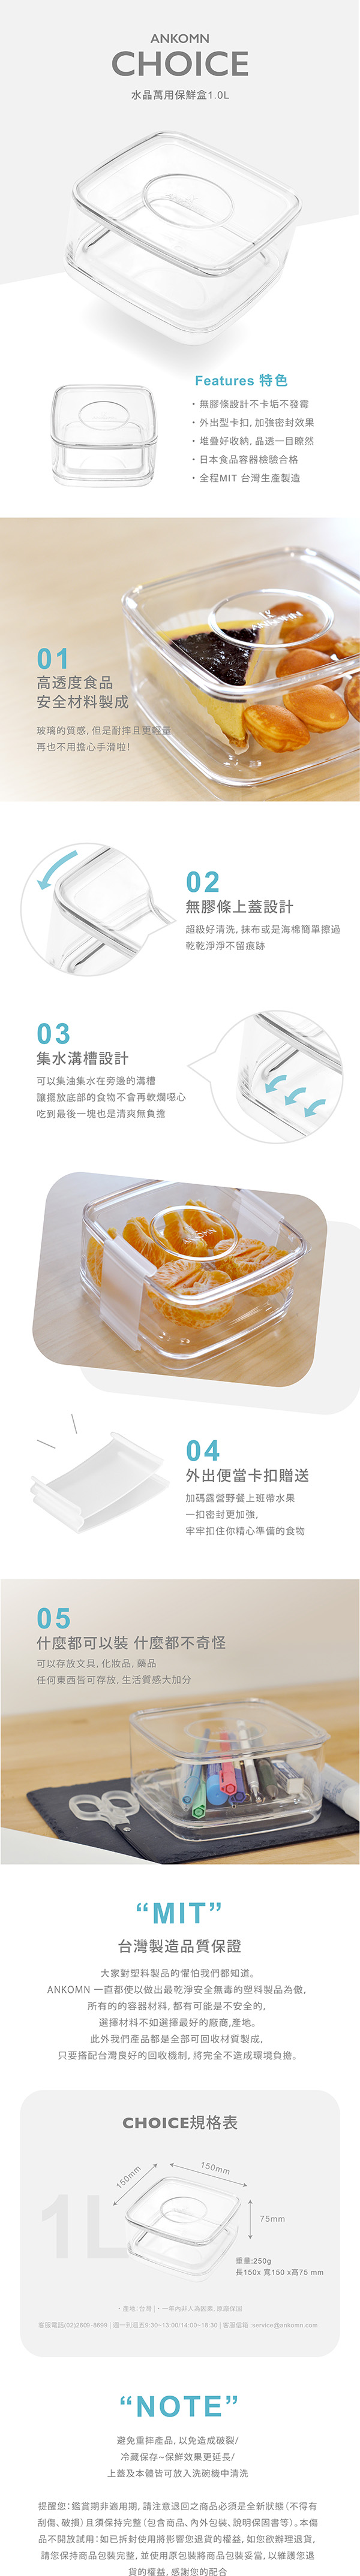 ANKOMN|CHOICE 萬用盒 1公升